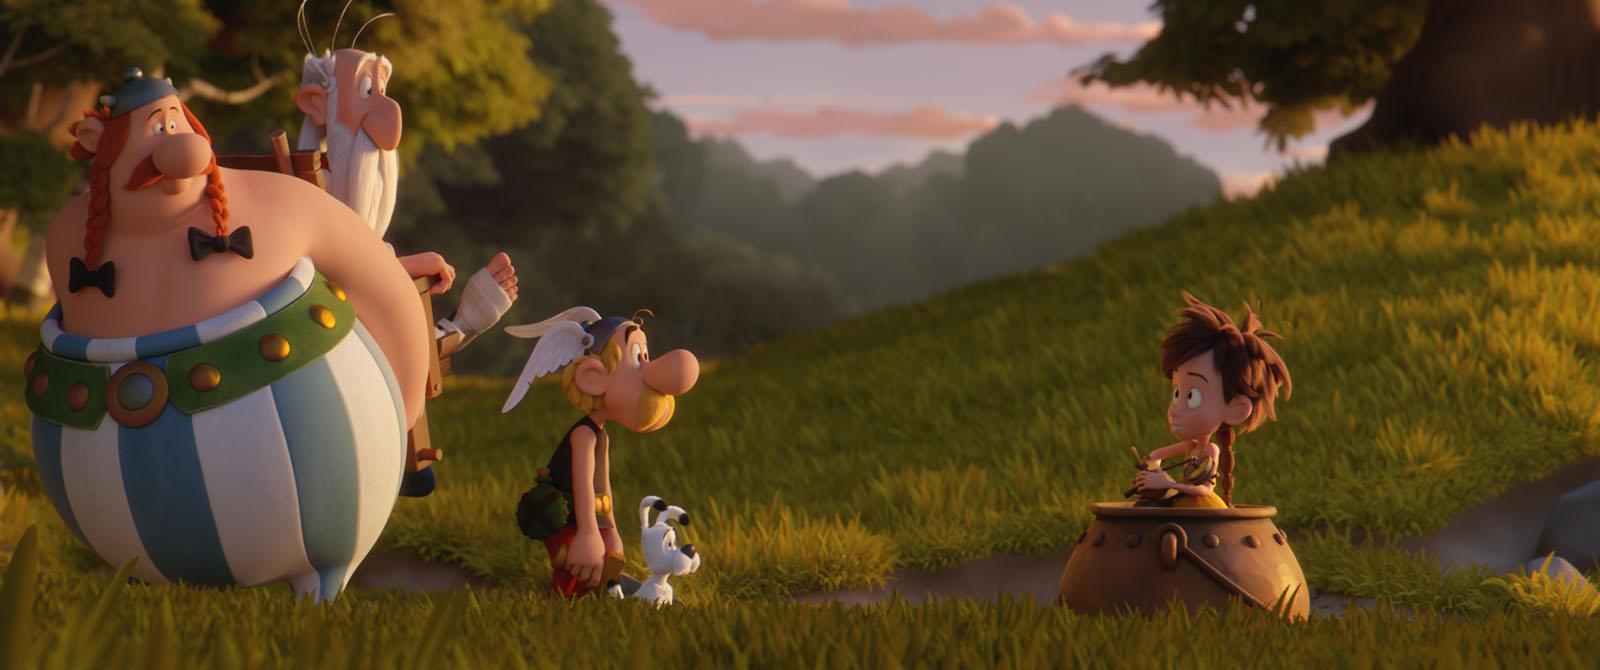 Obelix, Panoramix, Asterix 및 젊은 Pectin